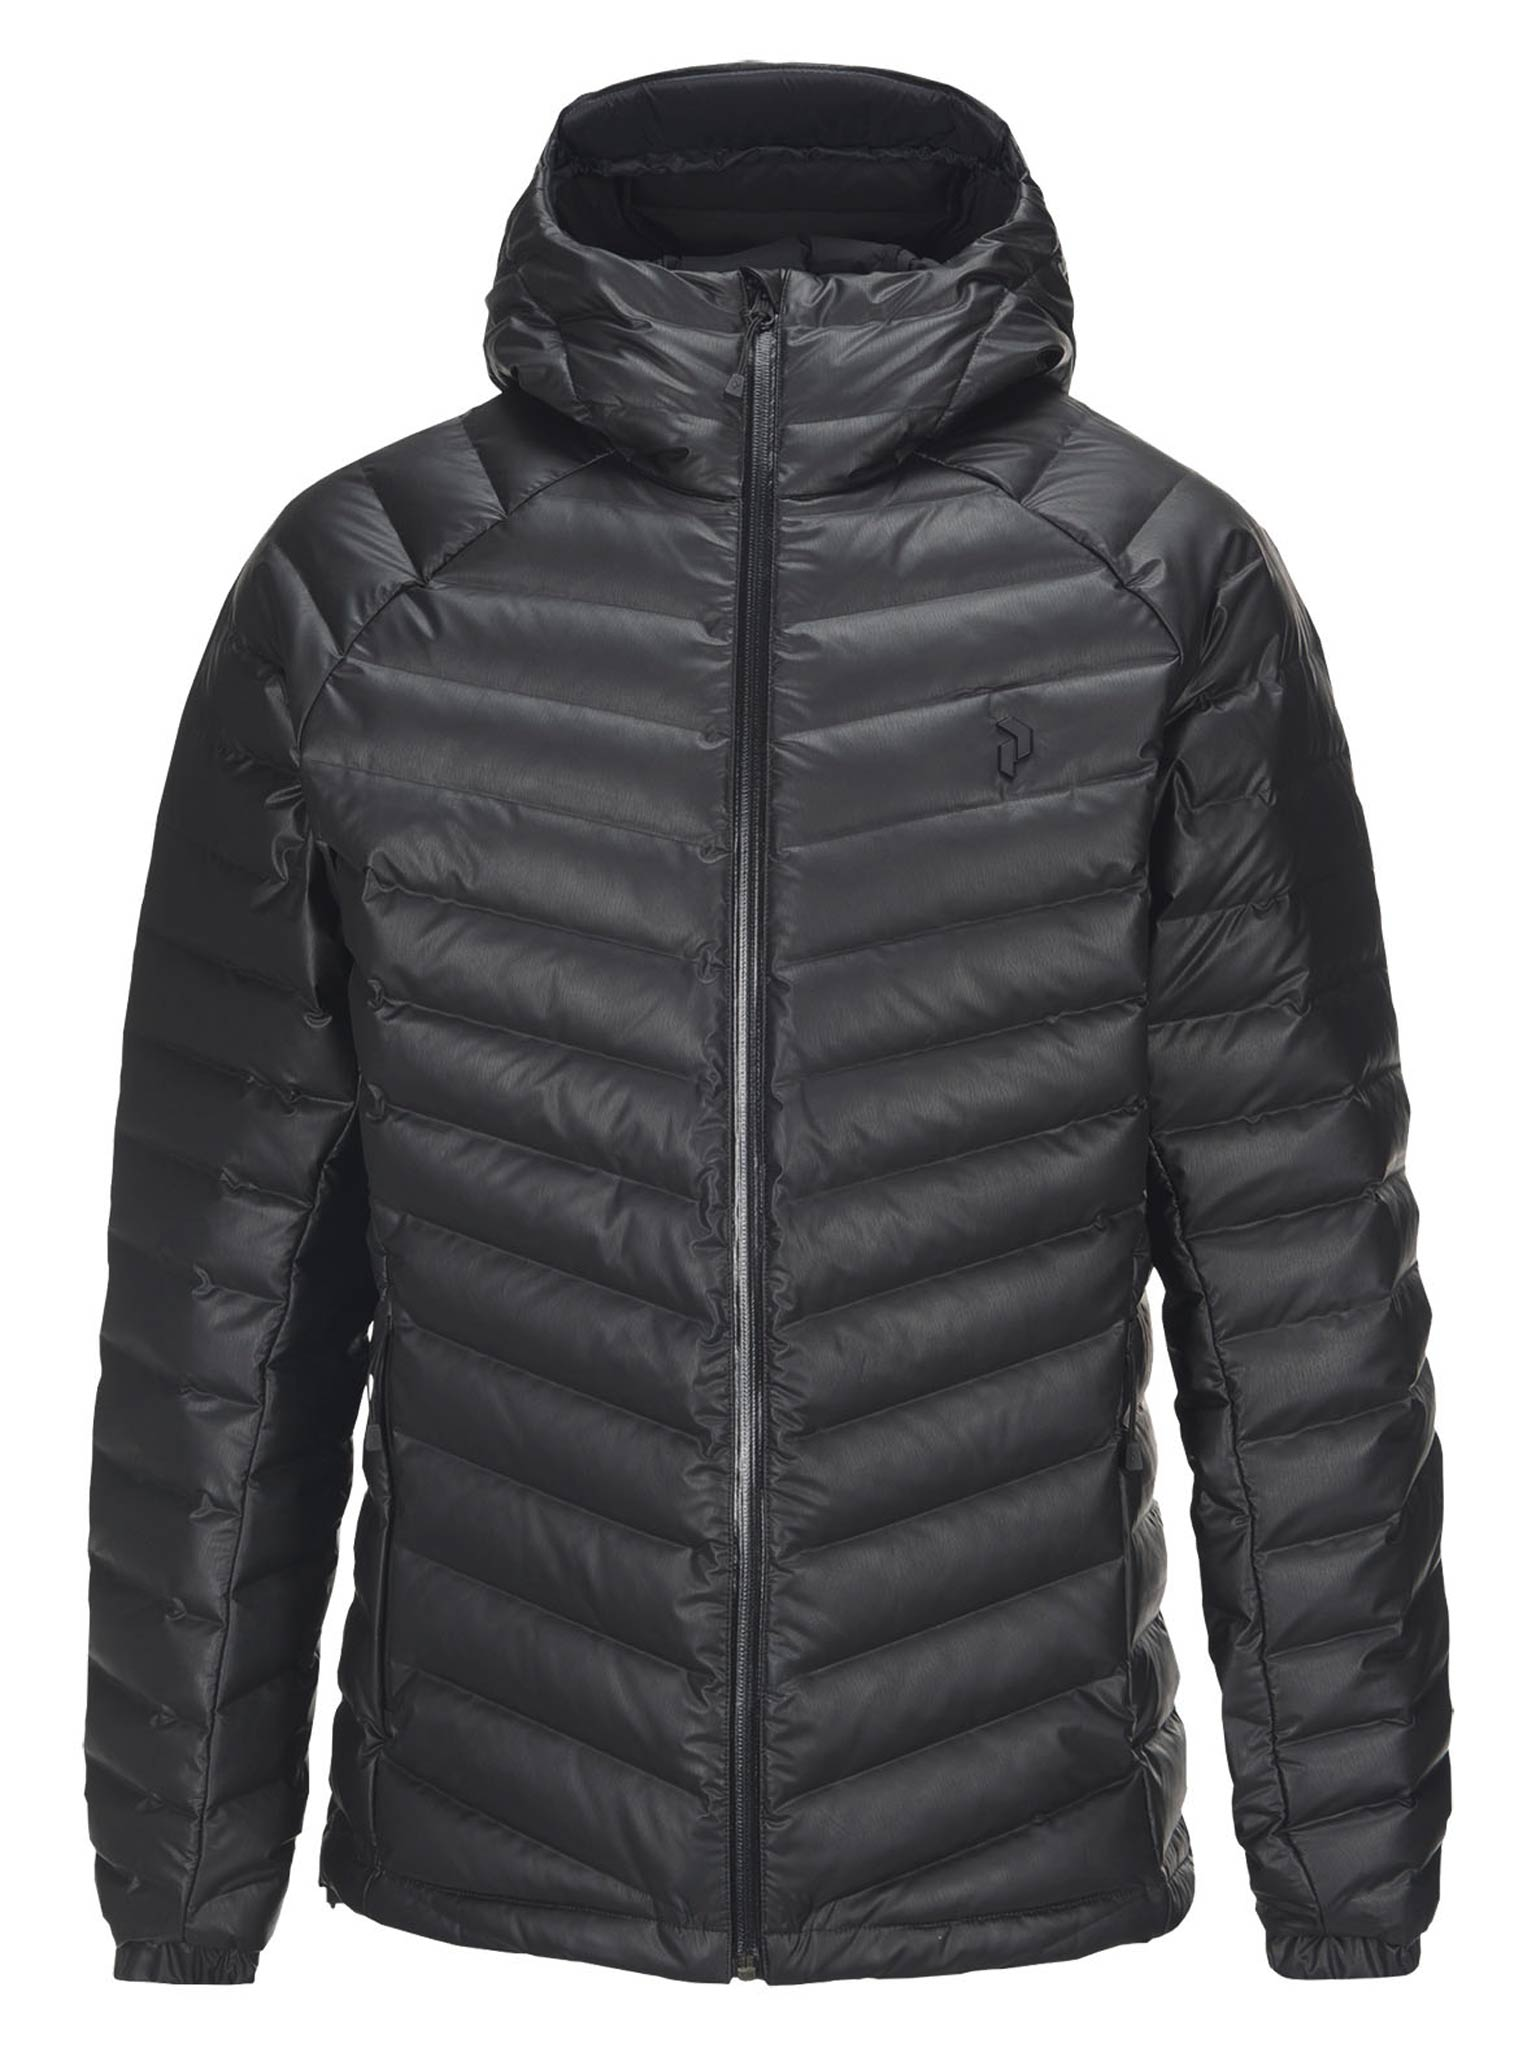 Peak Performance: Frost Dry Down Hood Jacket 18/19